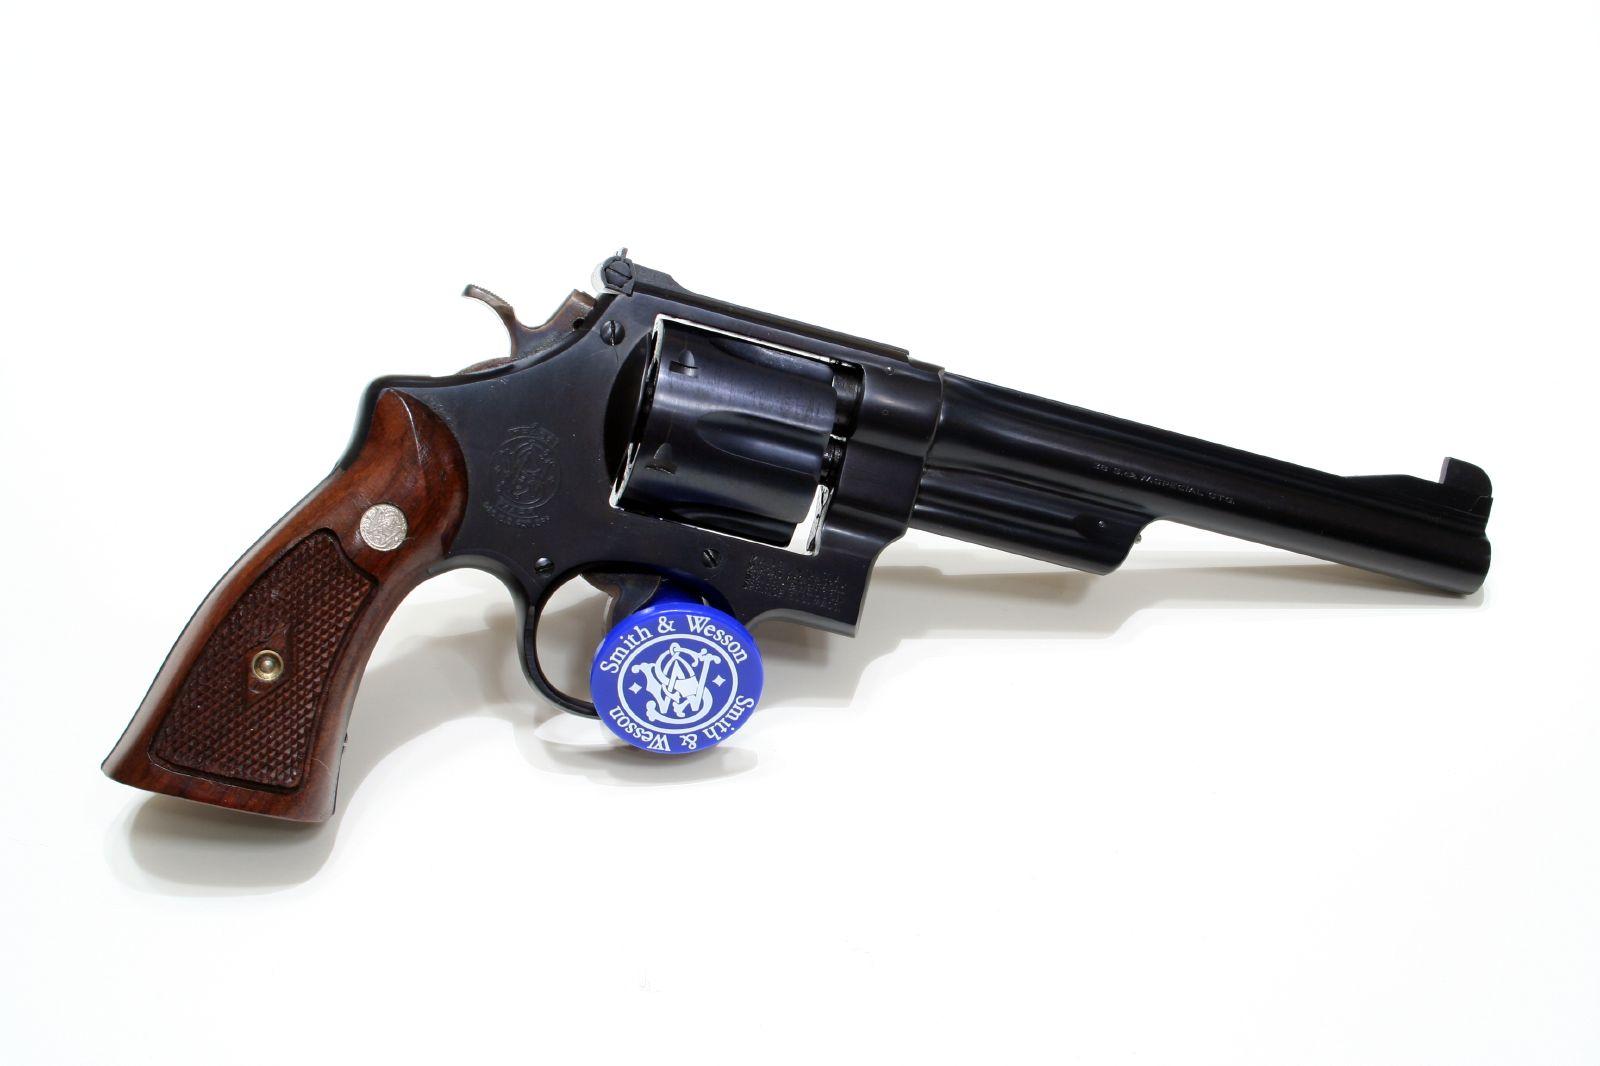 Smith & Wesson  38/44 - Wikipedia